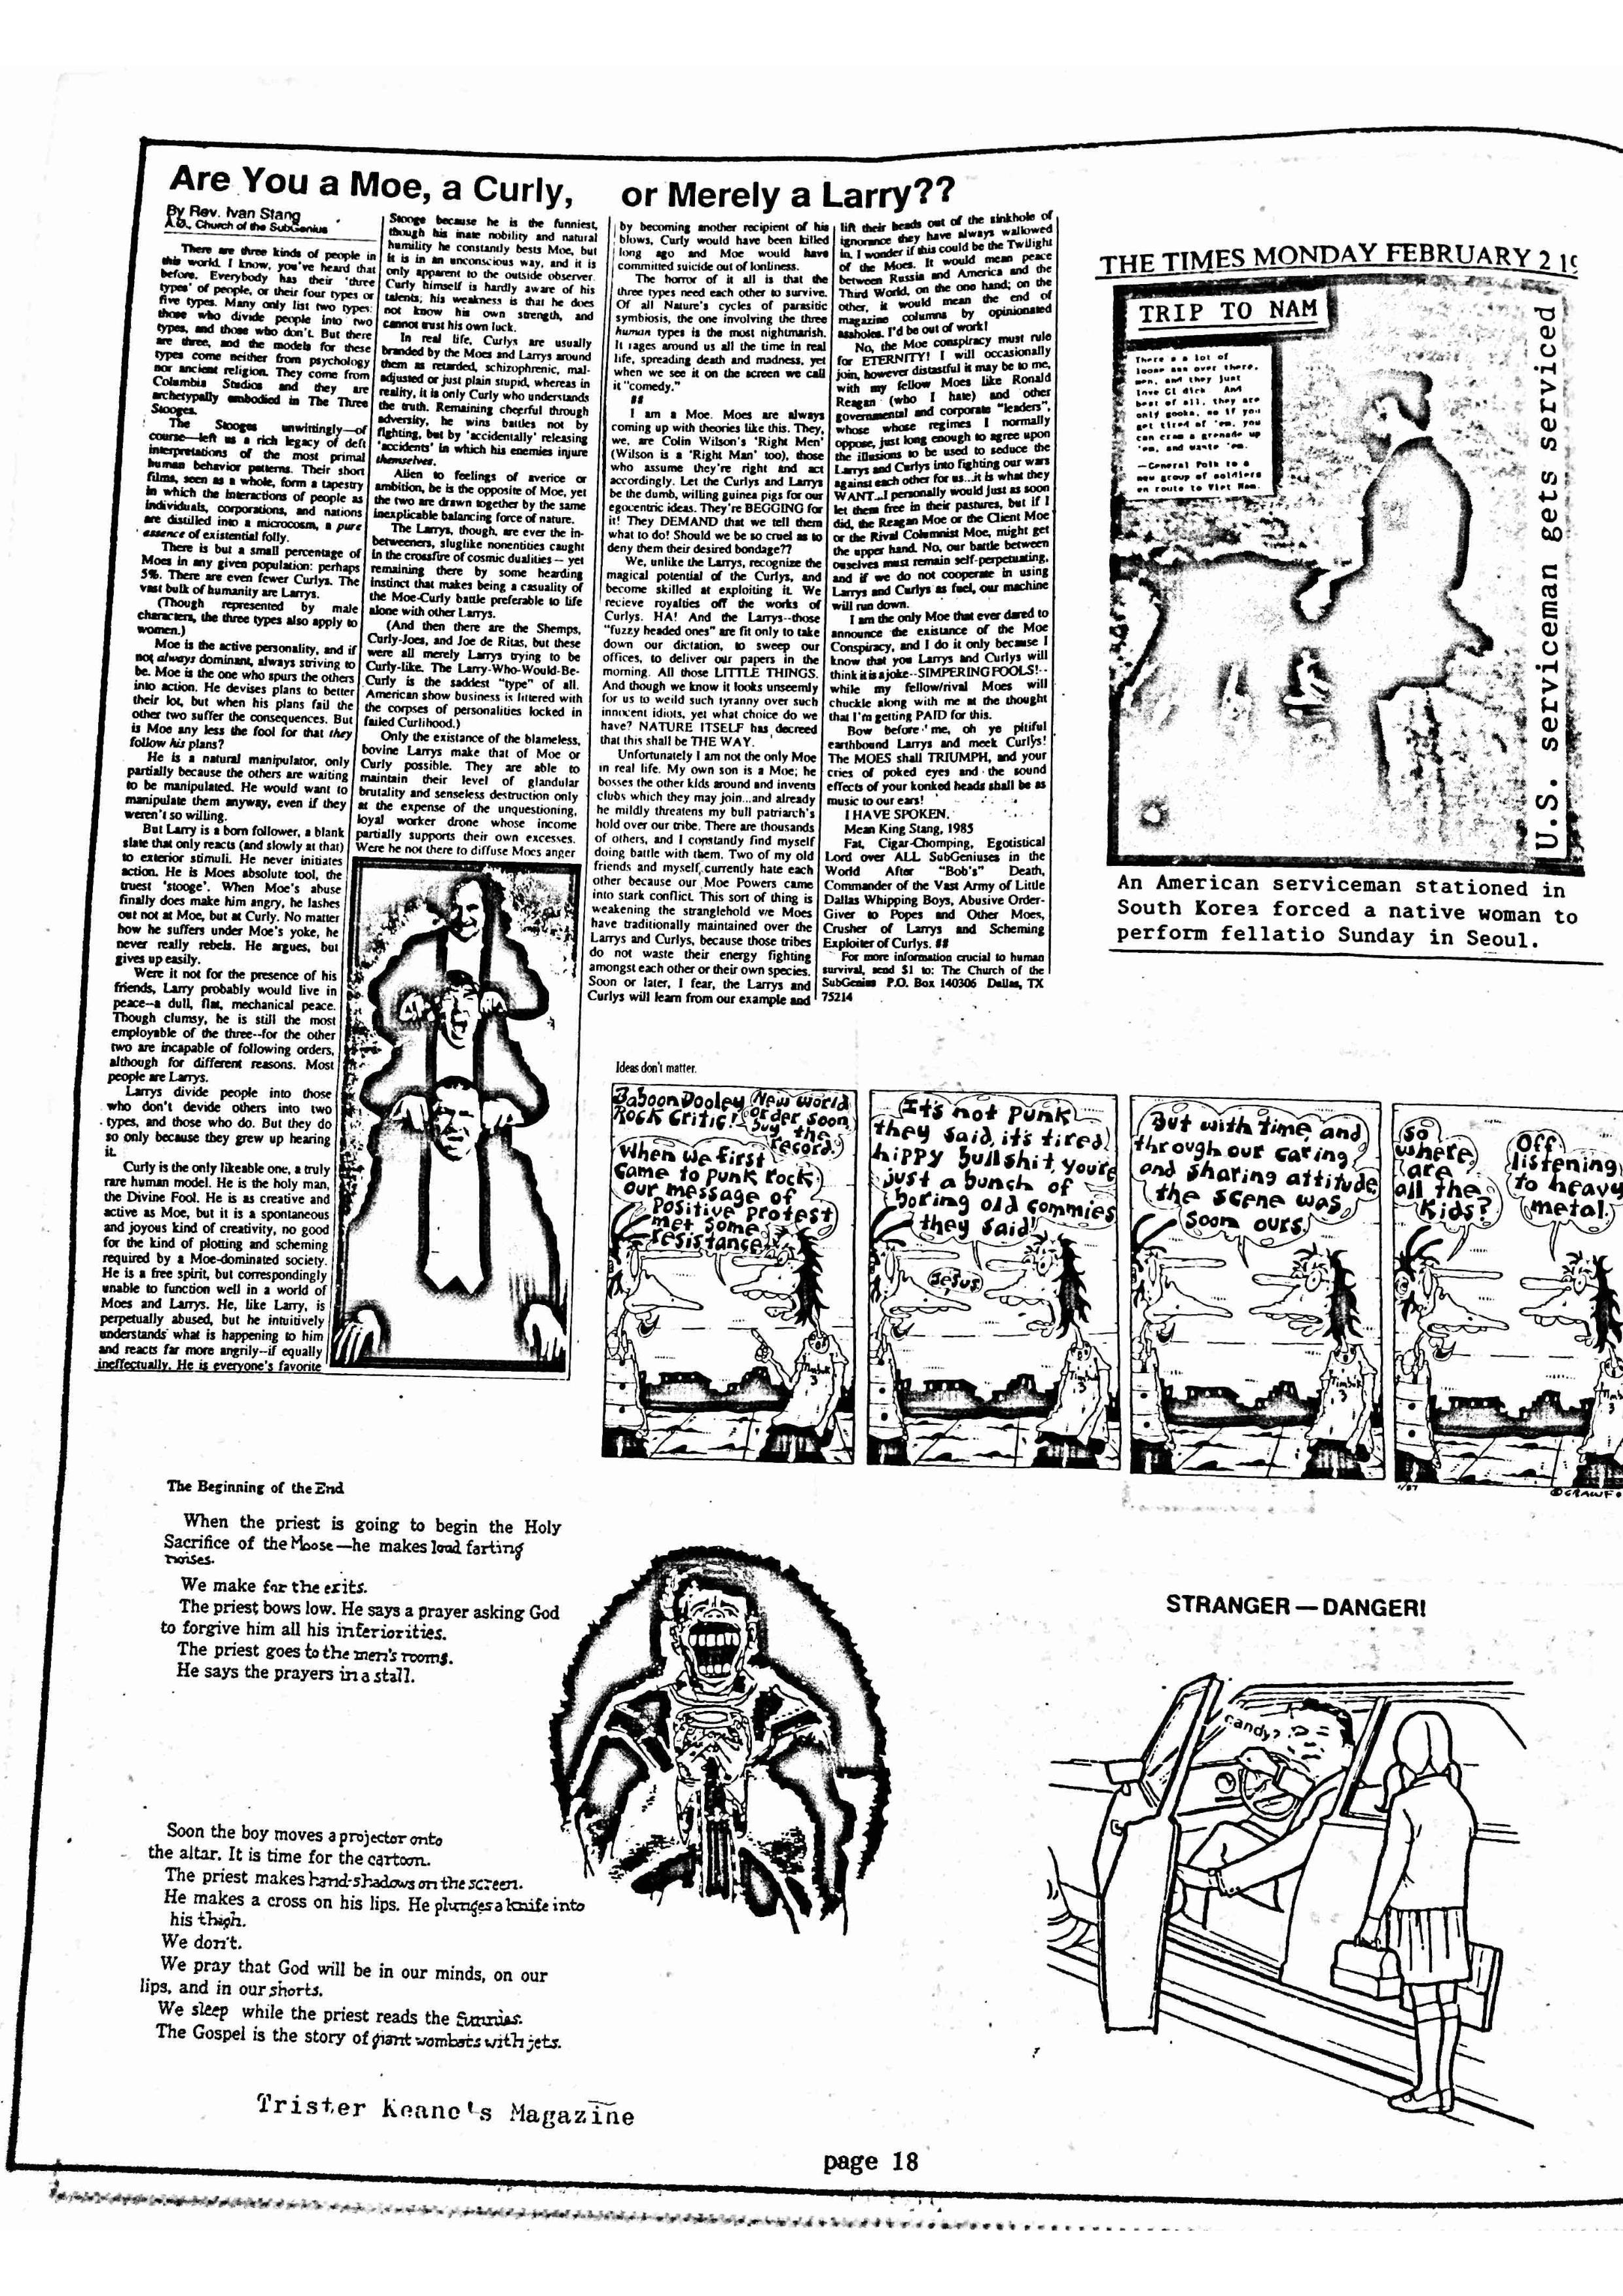 PopRealLast2-page-006.jpg